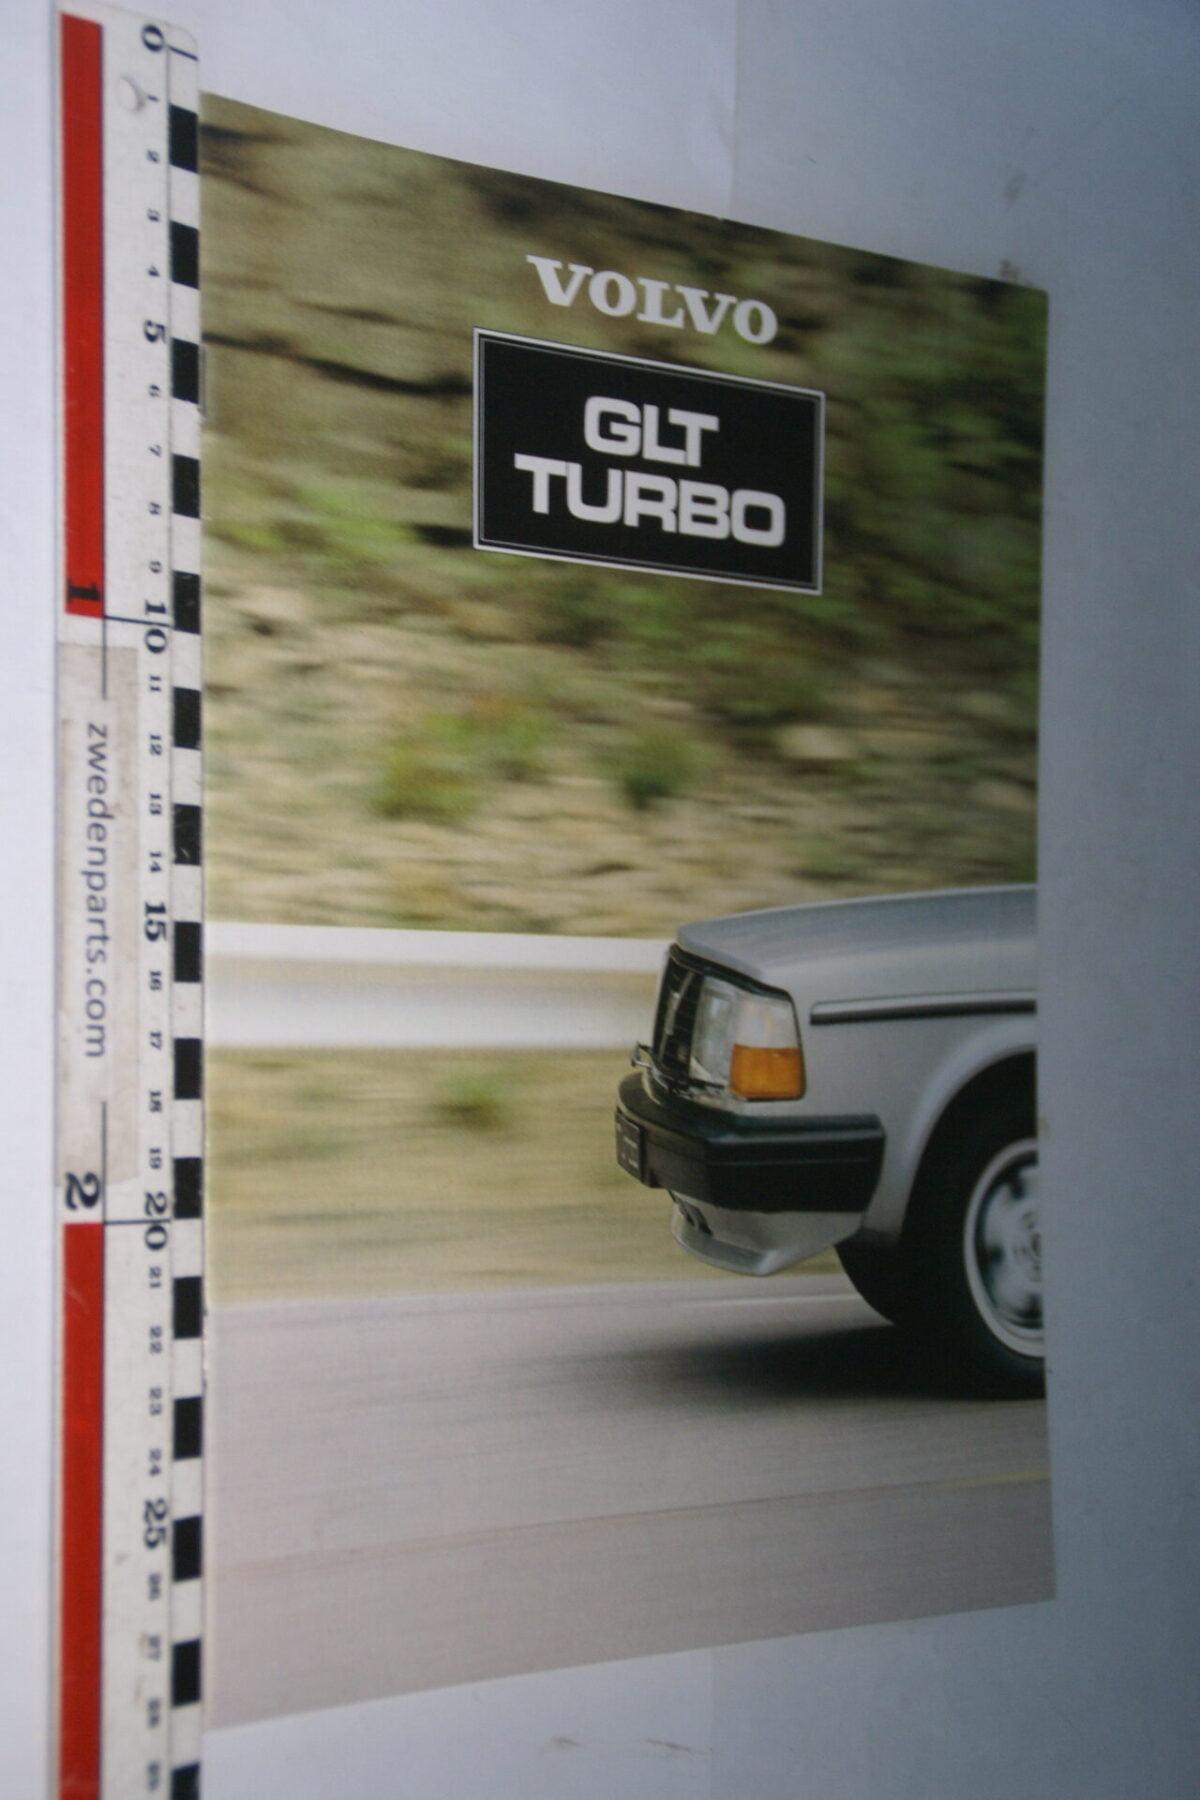 DSC07638 1981 originele brochure Volvo 244GLT Turbo nr ASPPV 8640, Svenska-abb8f260